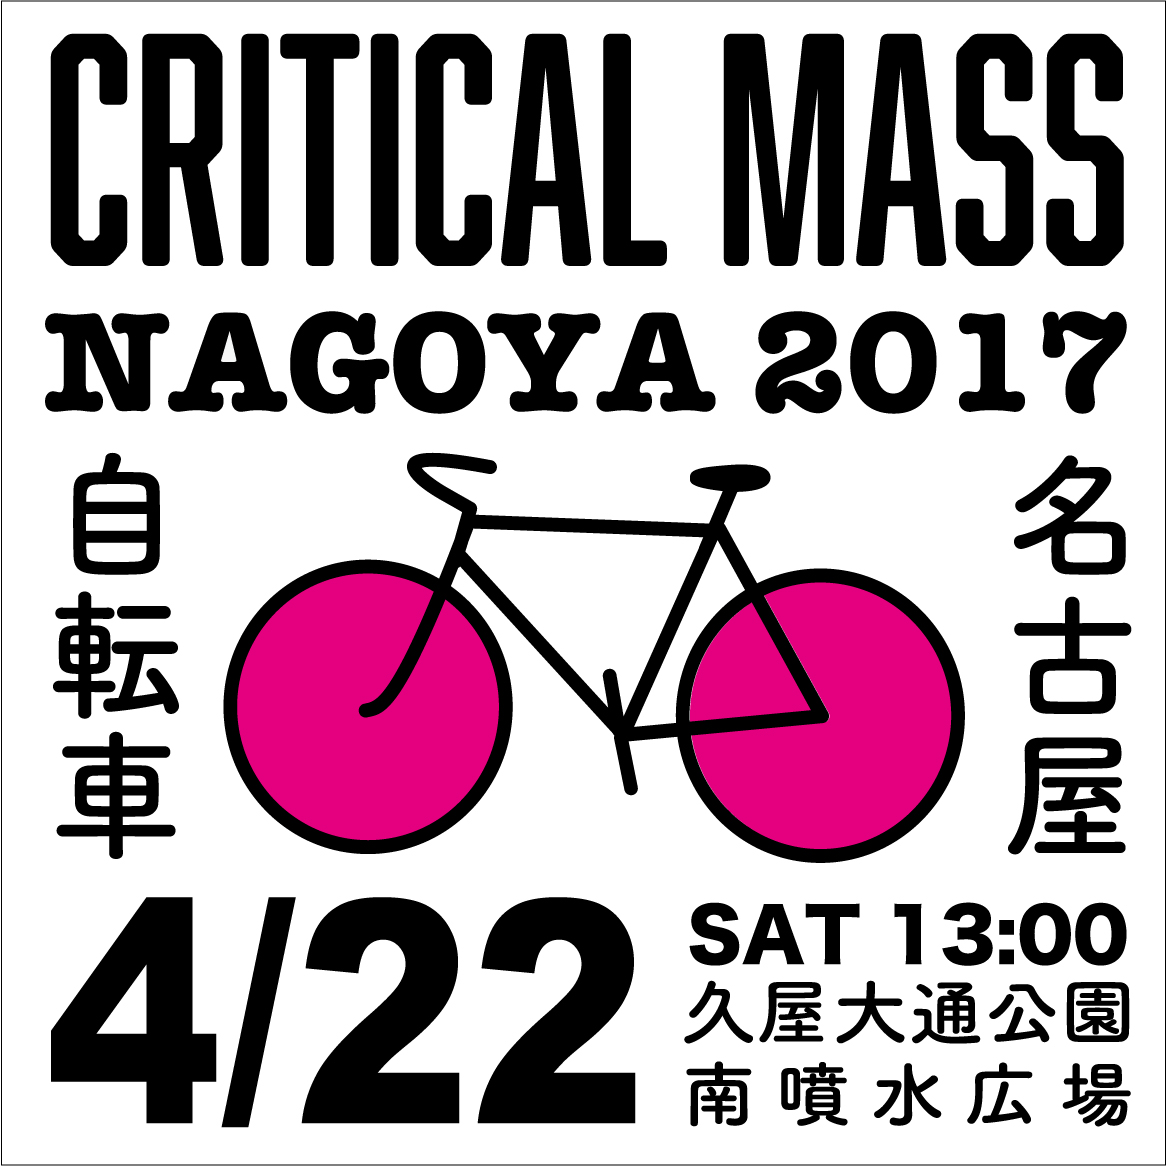 Critical Mass Nagoya